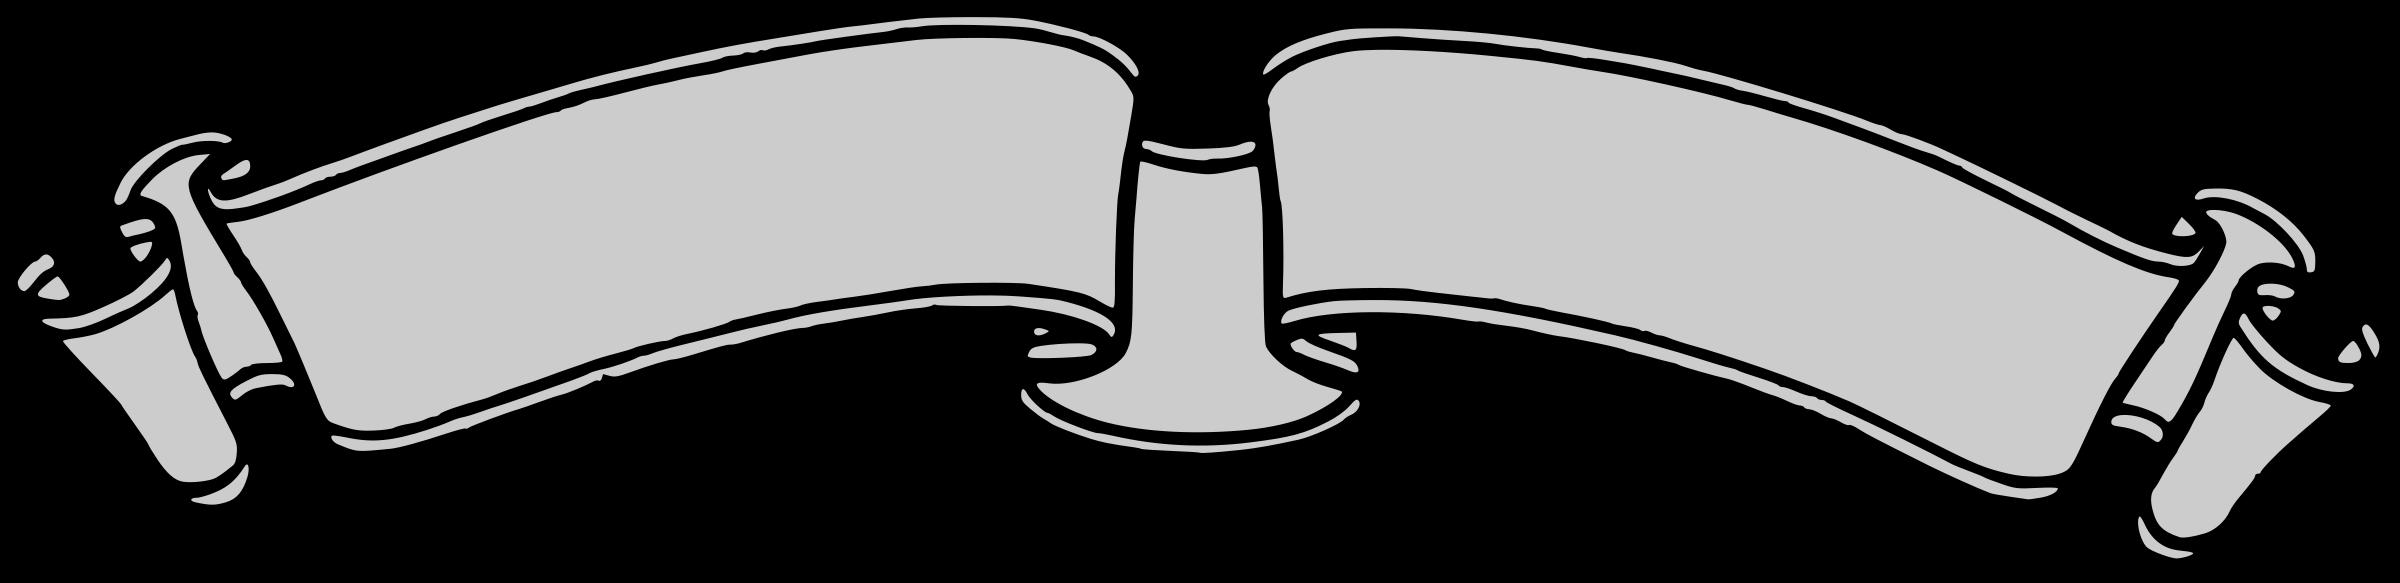 2400x583 Blank Ribbon Clip Art